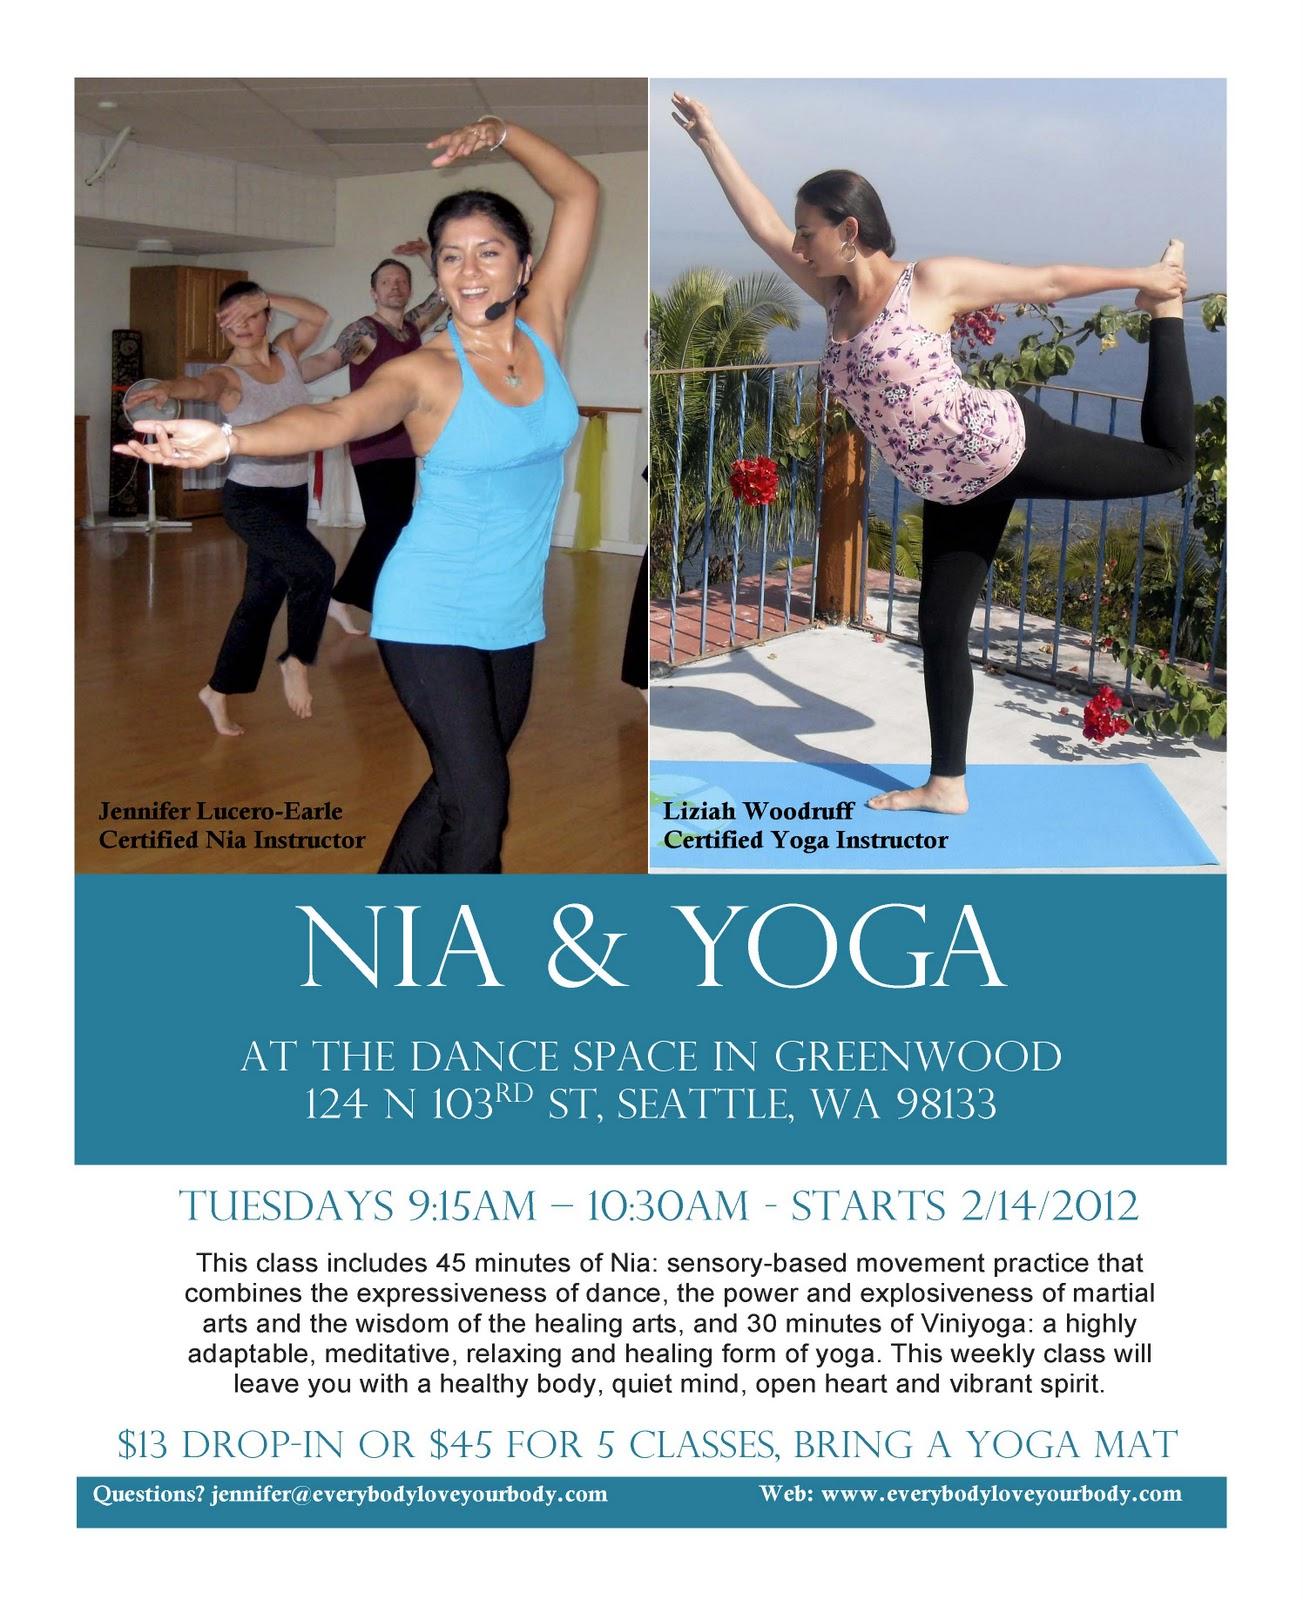 Pilates Mat Class Description: Everybody, Love Your Body: New Nia-Yoga Class Starts